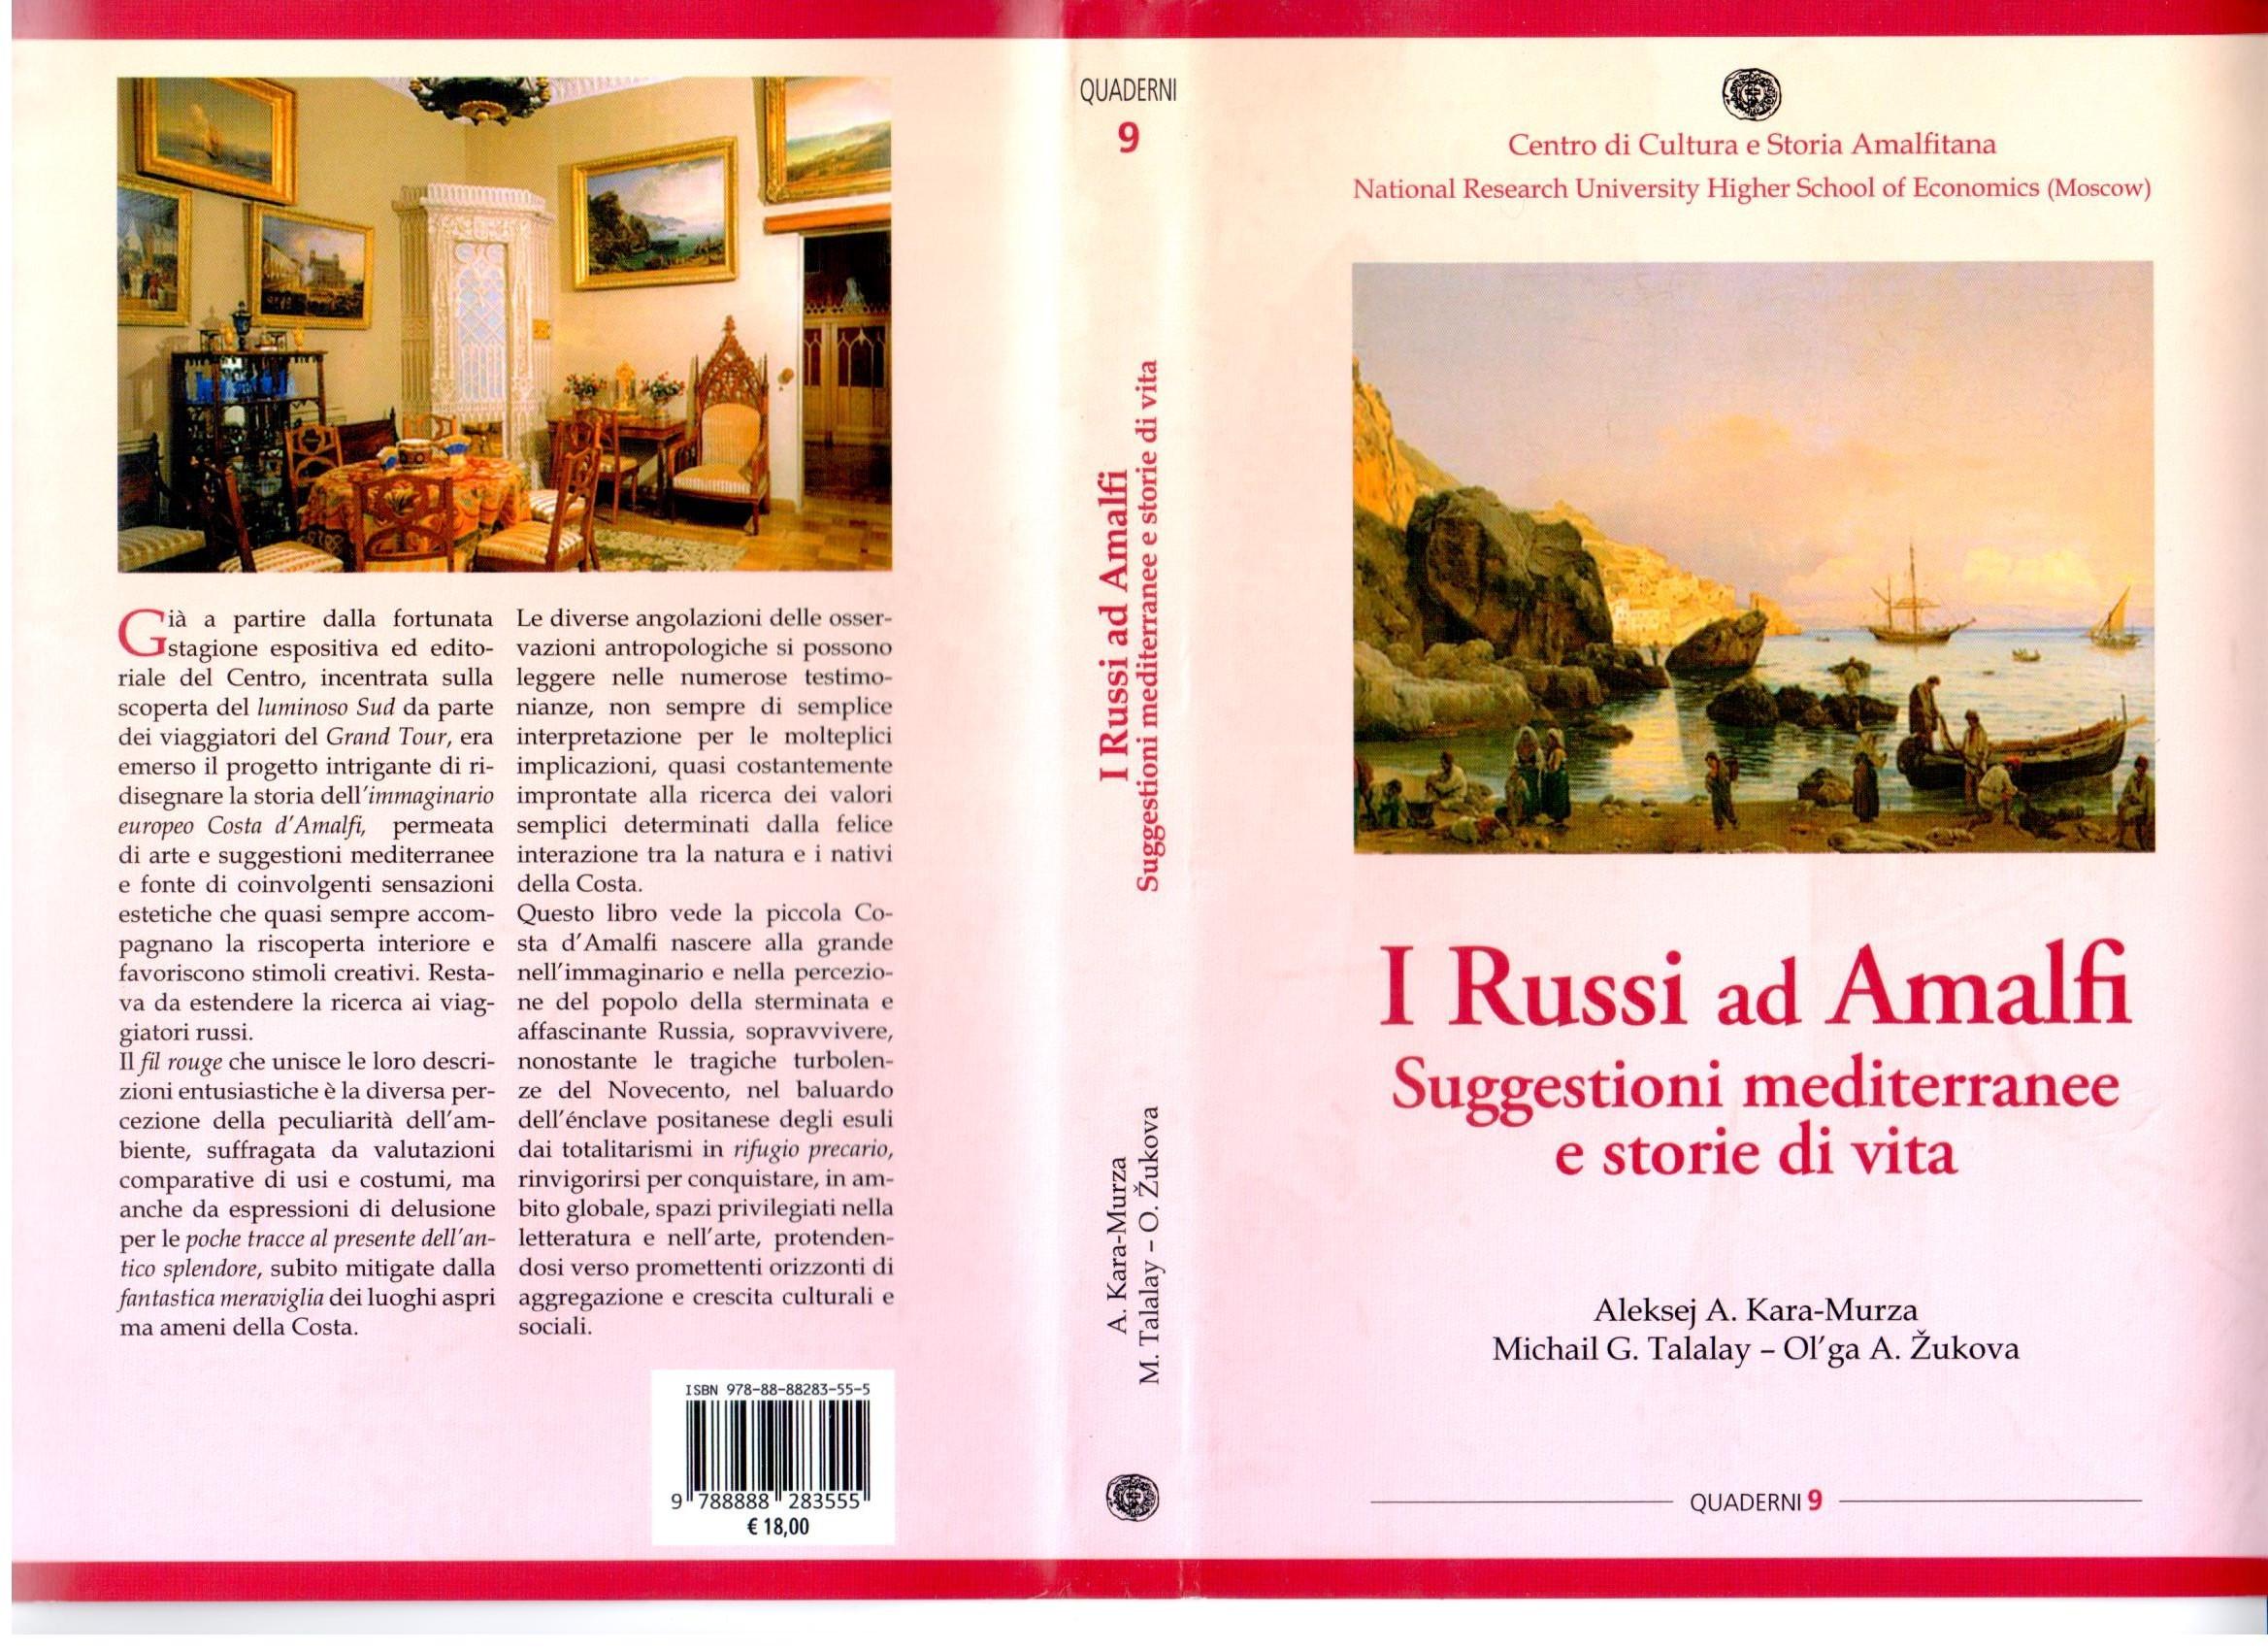 I Russi ad Amalfi. Suggestioni mediterranee e storie di vita